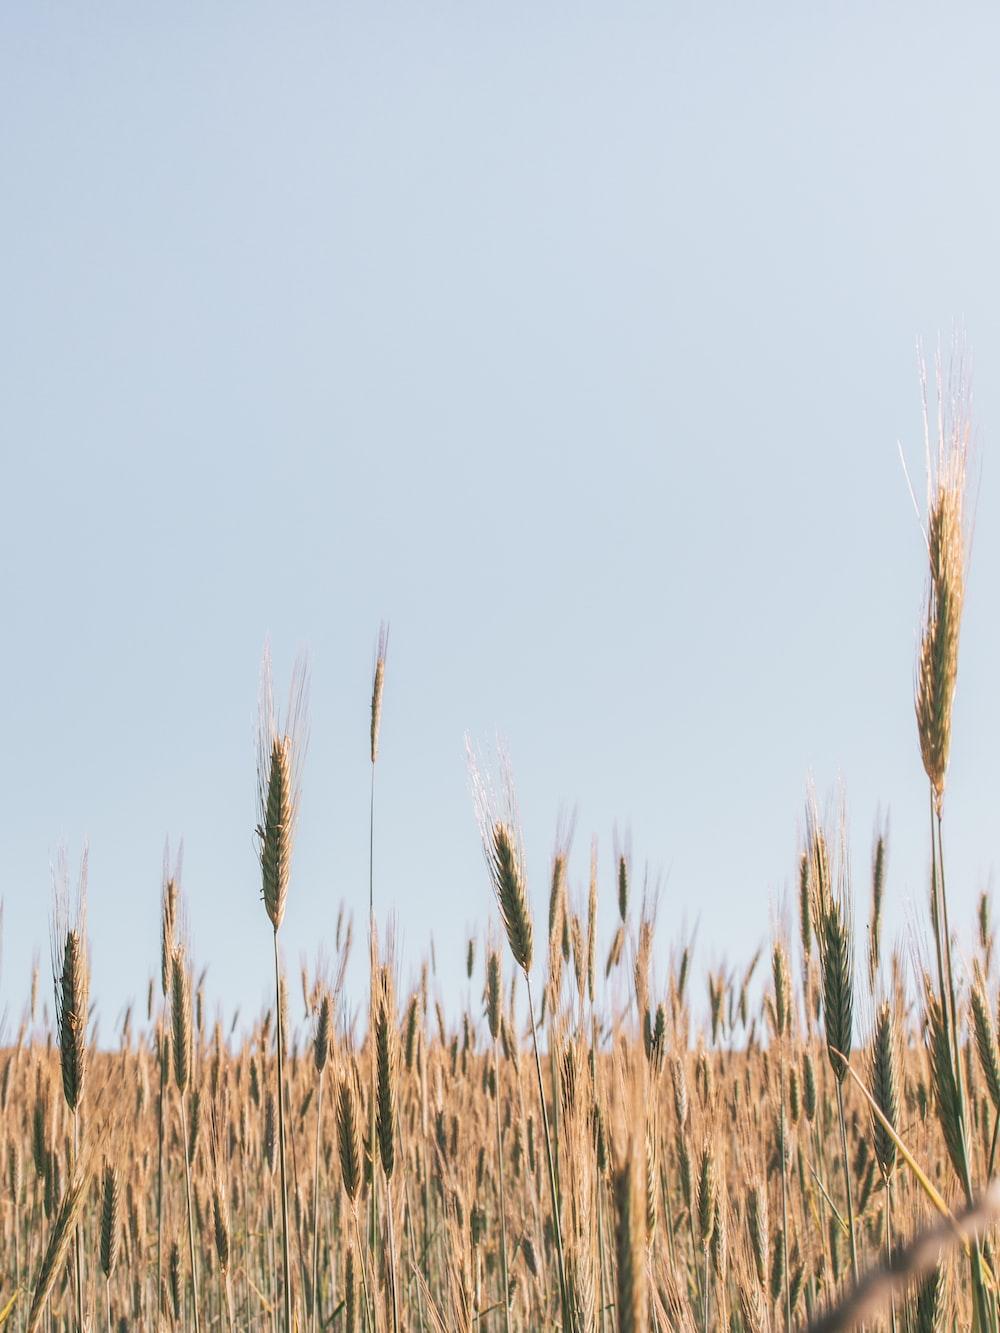 brown grains photograph